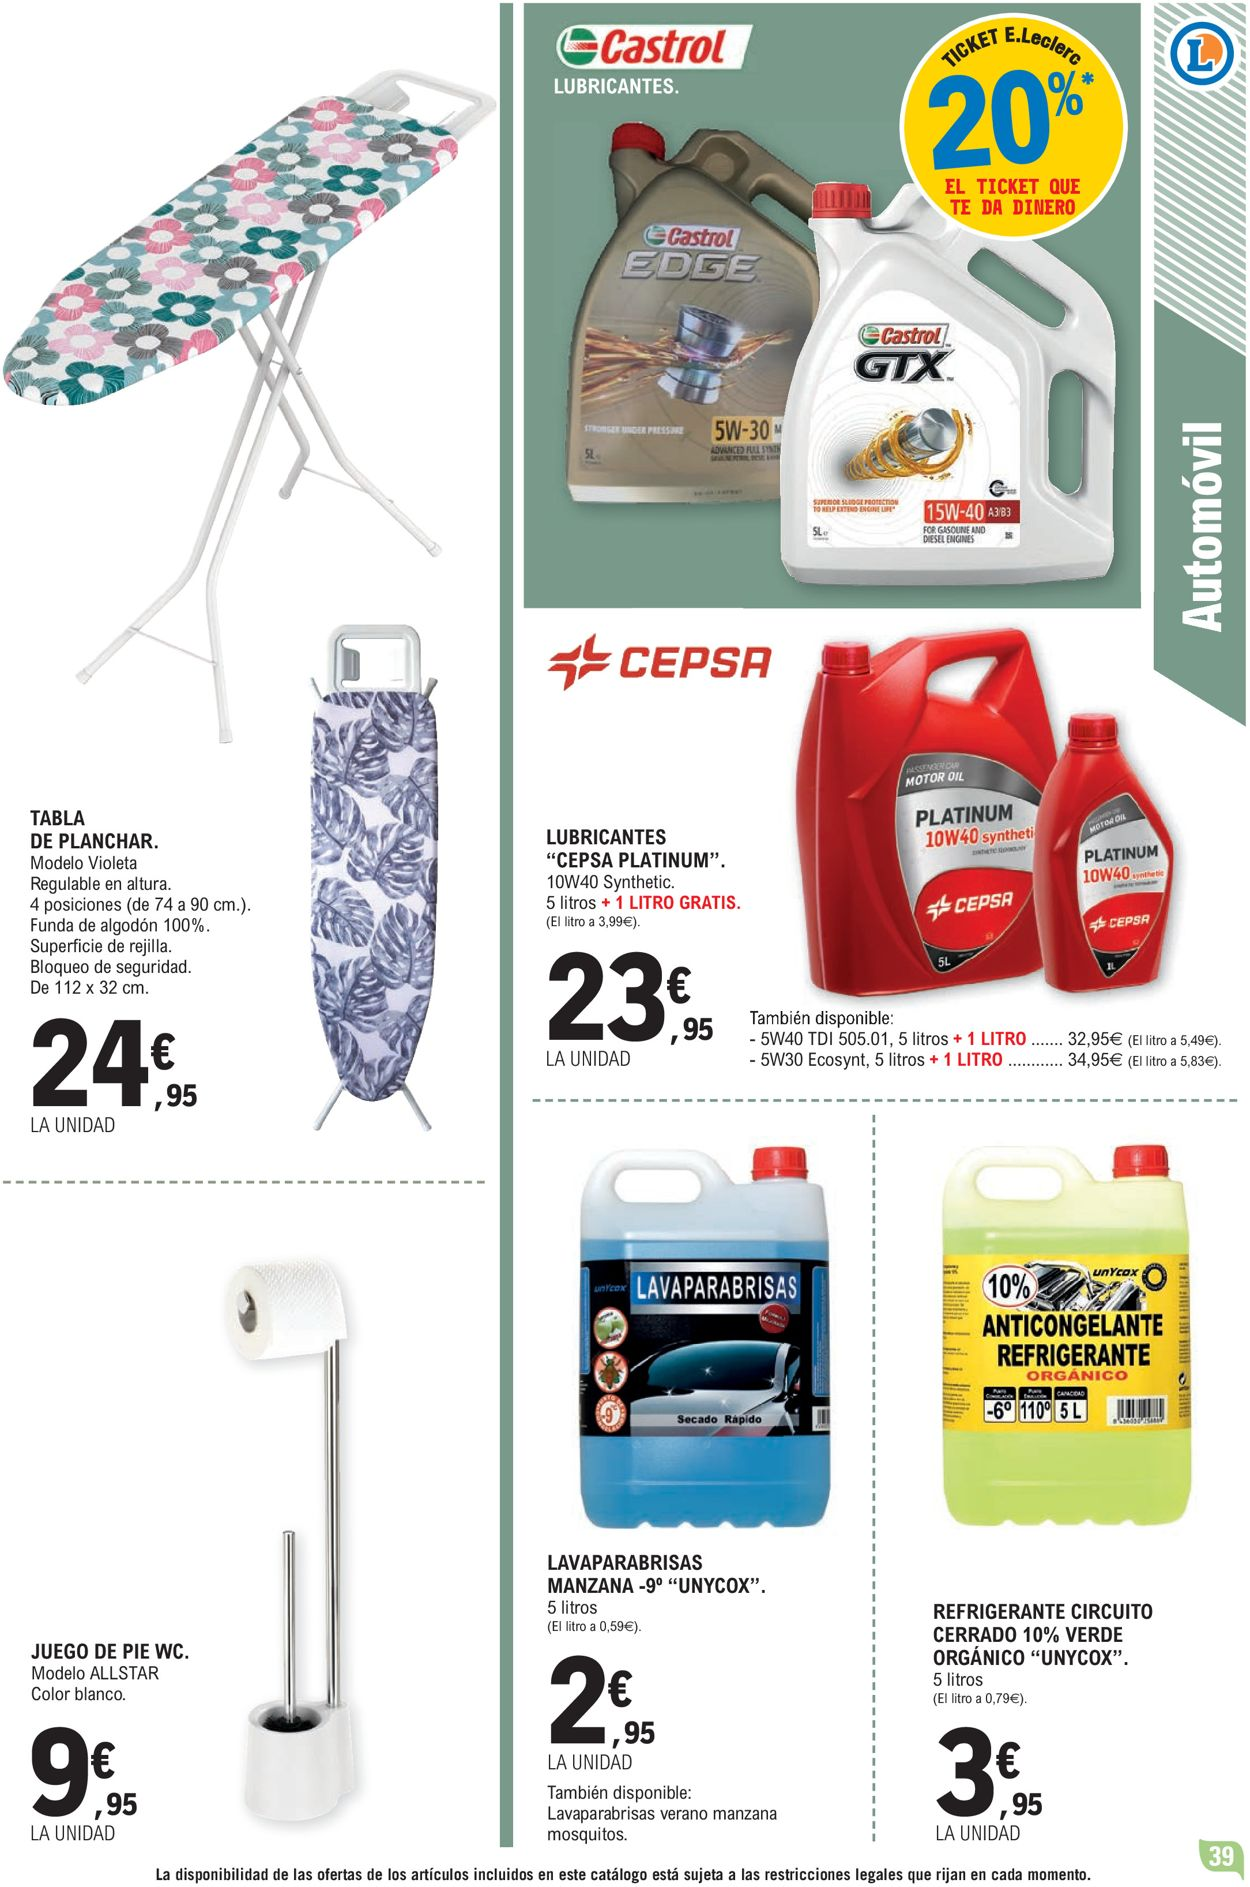 E.leclerc Folleto - 24.03-04.04.2021 (Página 39)